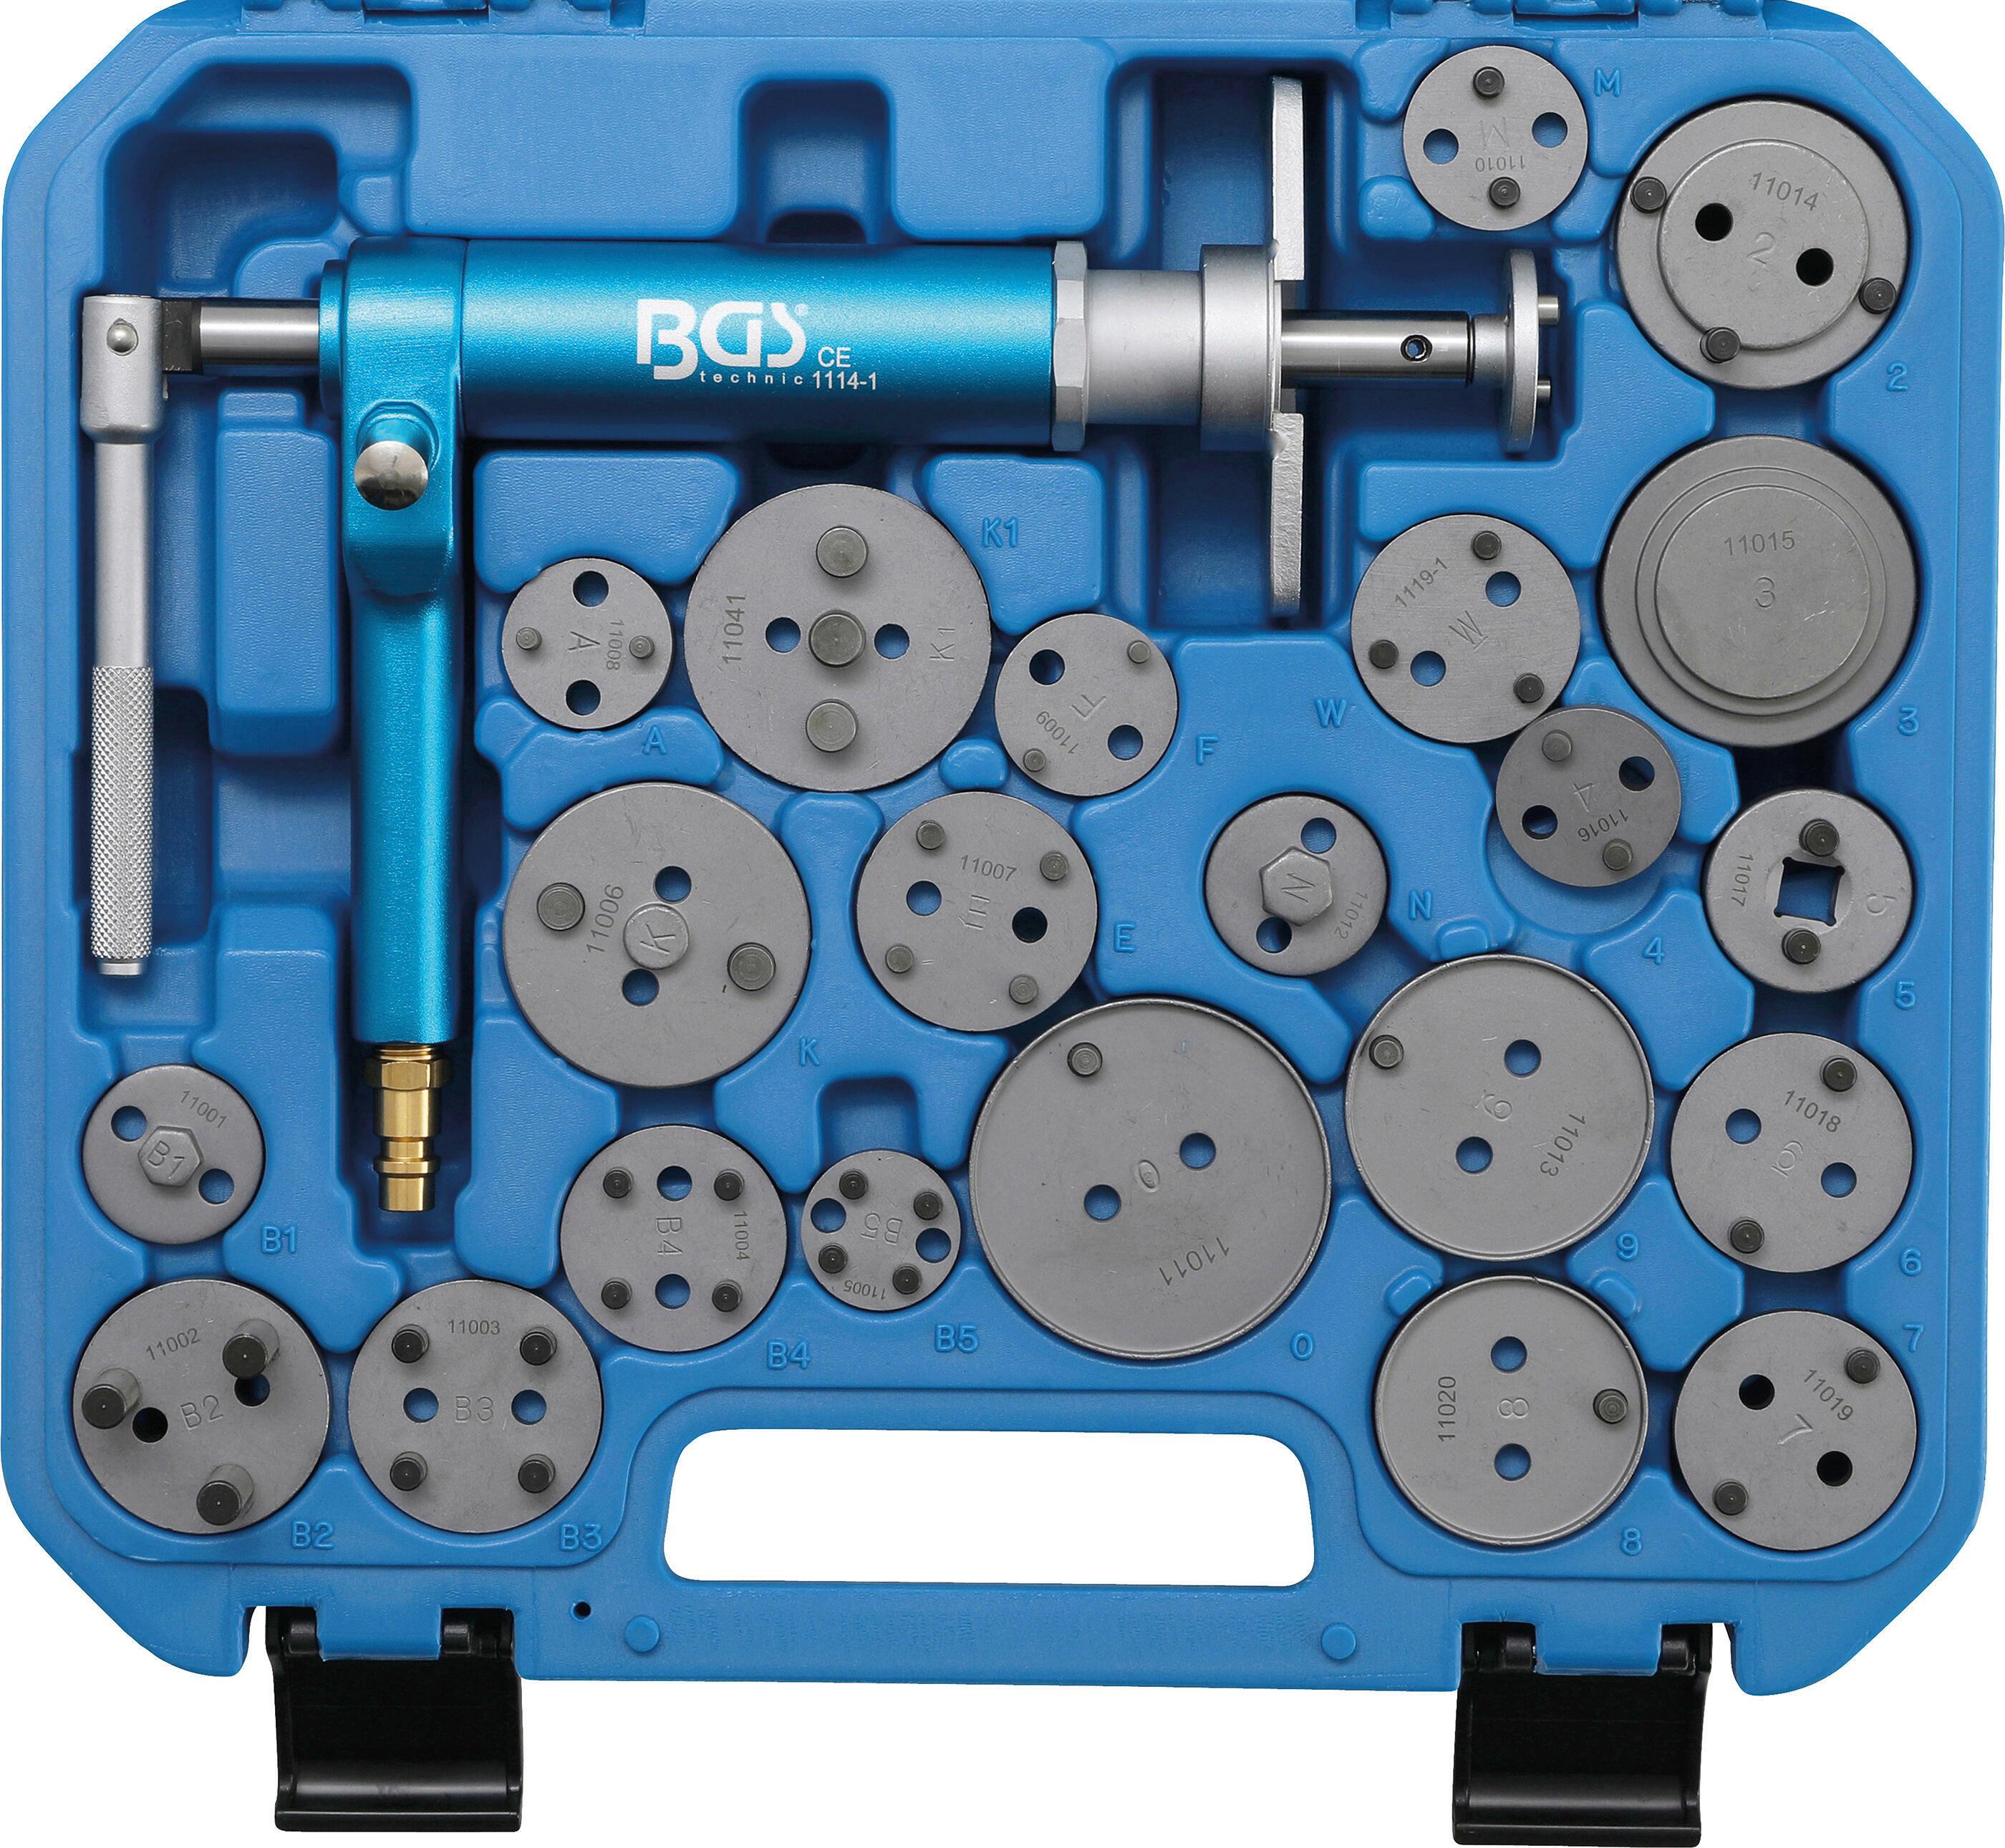 BGS Dreh-/Rückstellwerkzeugsatz, Bremssattelkolben